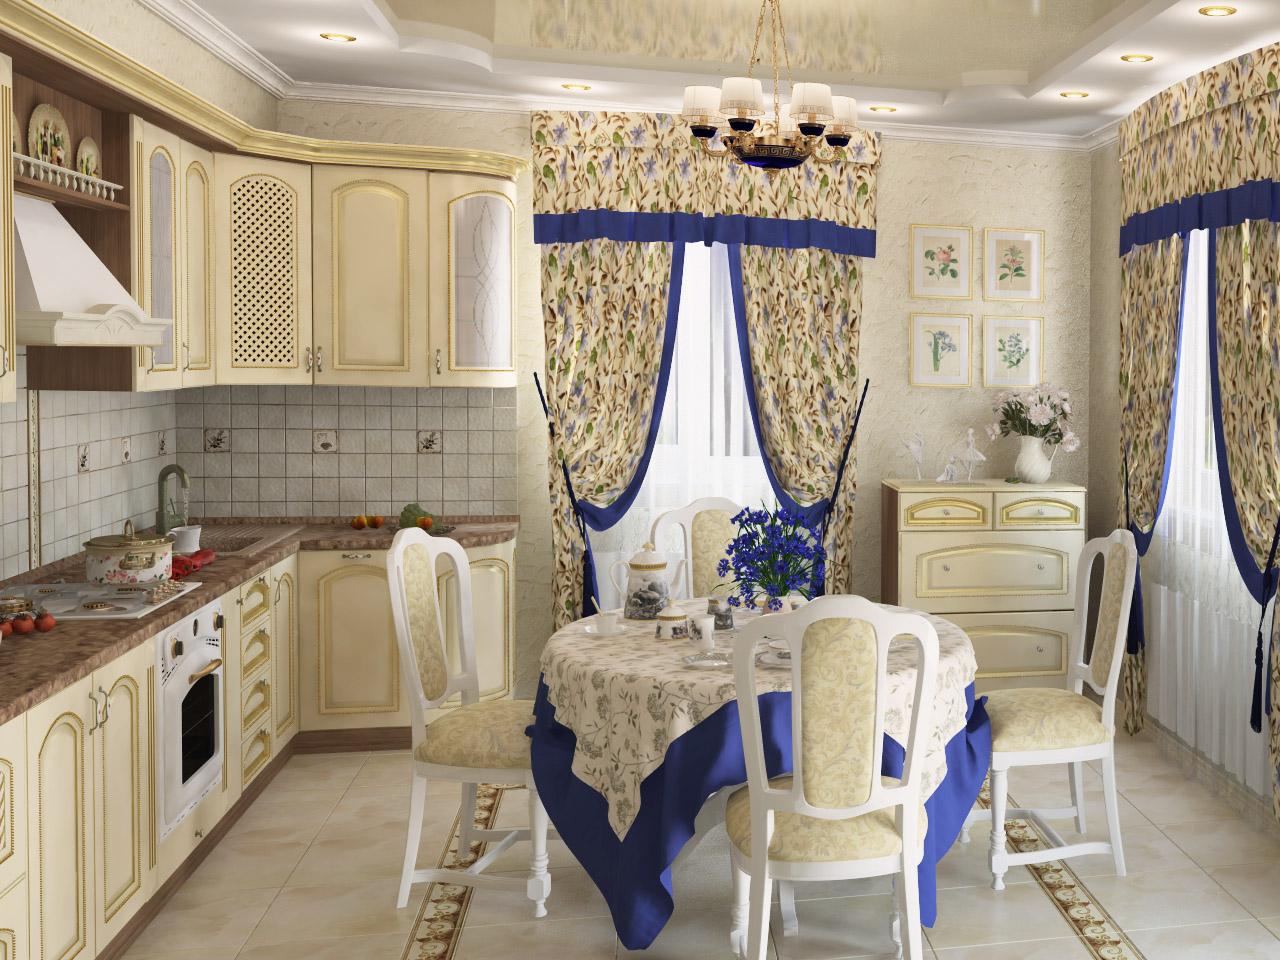 французский прованс стиль текстиля для дачи или загородного дома